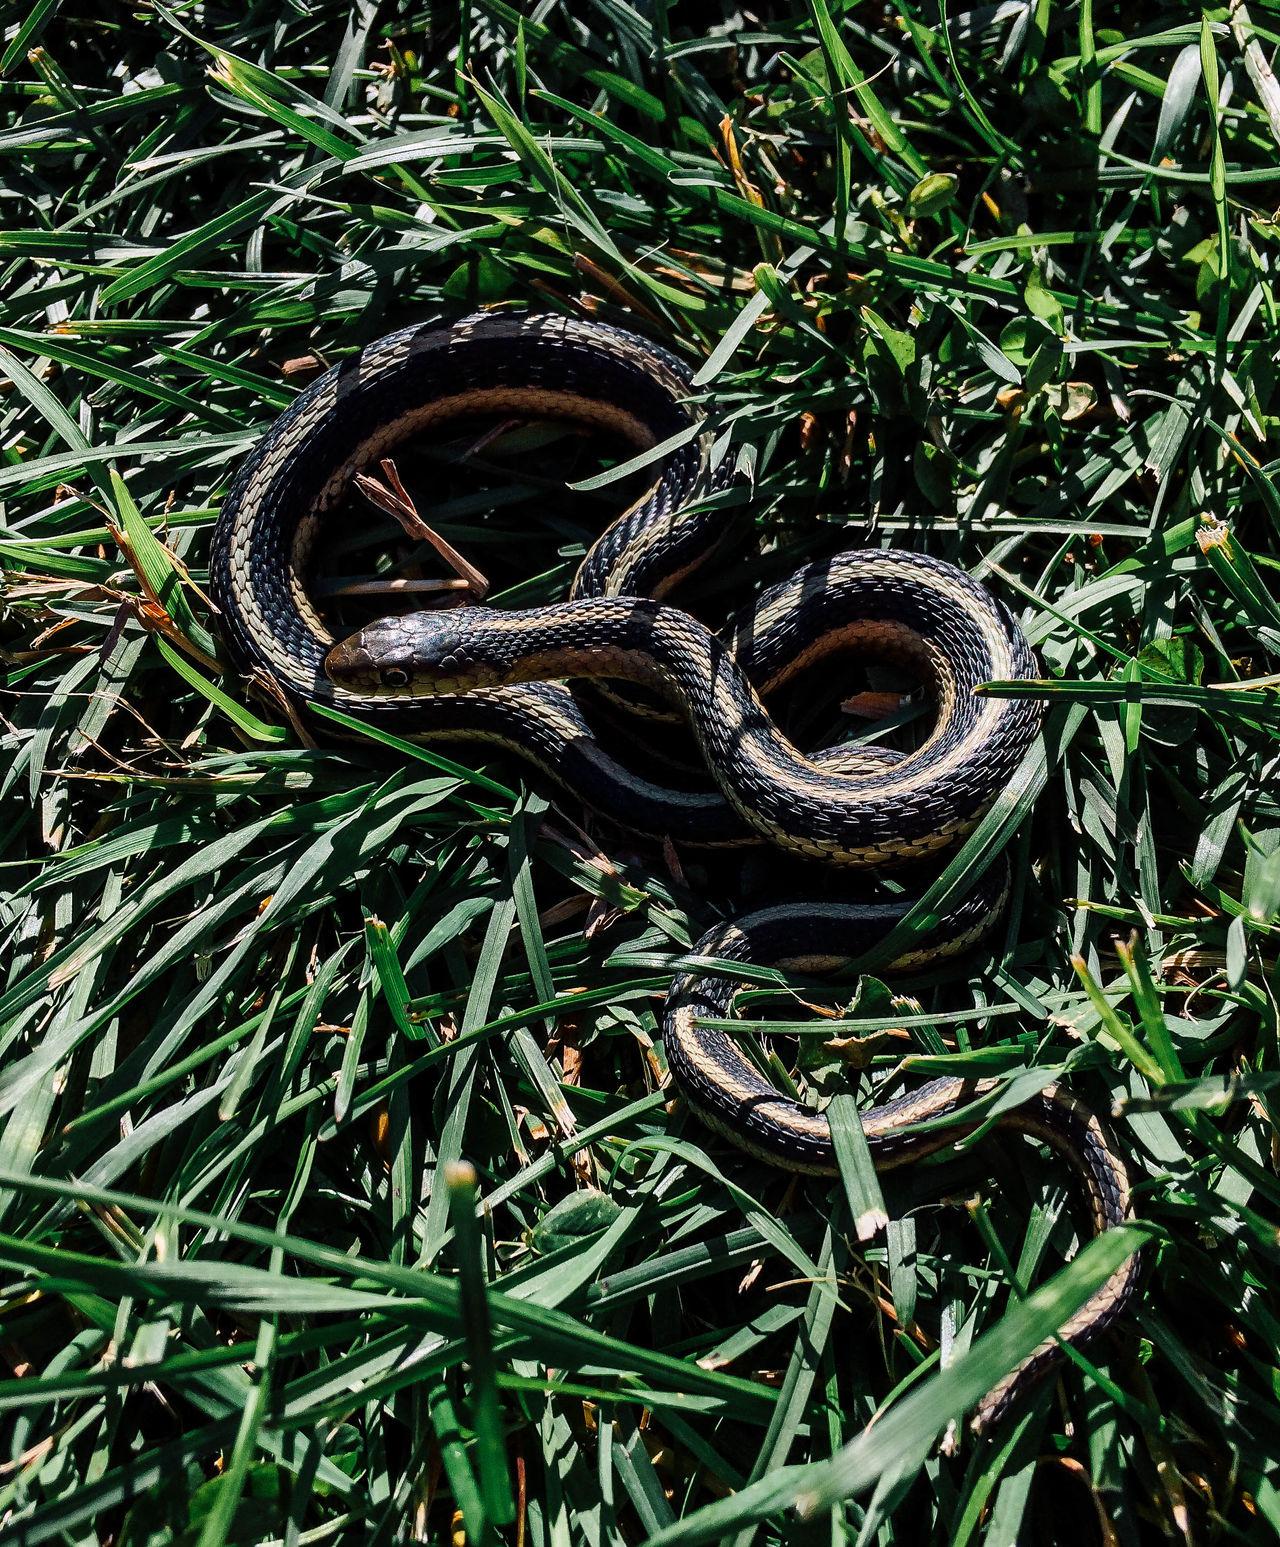 Curling Gartersnake Grass Grass Grassy Herpetology Reptile Slither Slithery Little Snake Snake